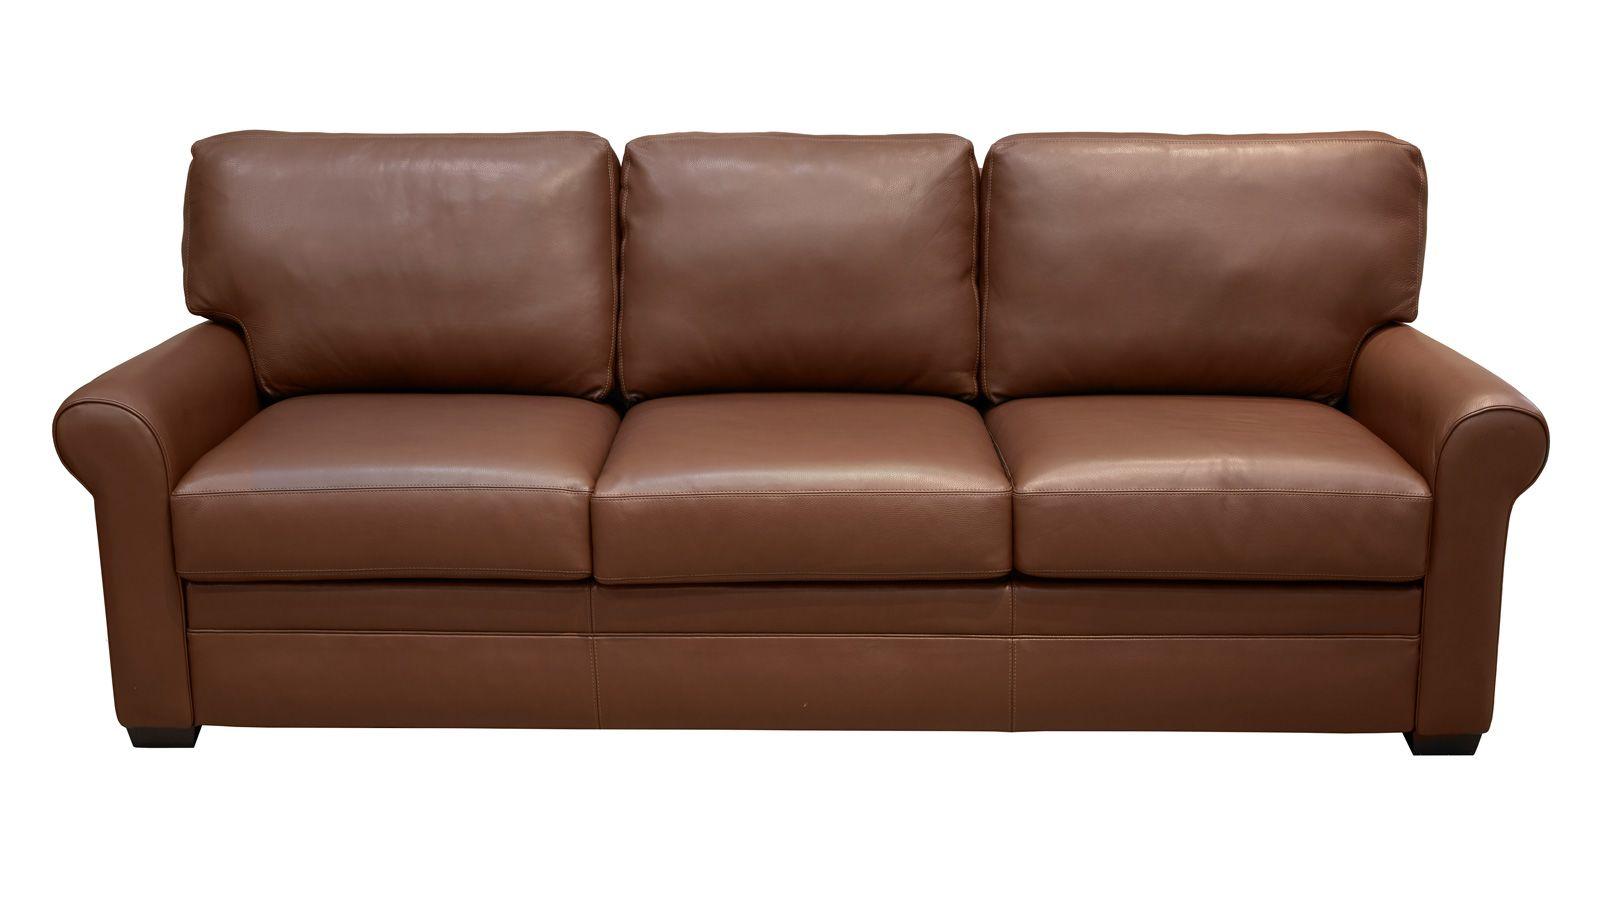 Gina Bison Tobacco King Sleeper Sofa, , hi-res